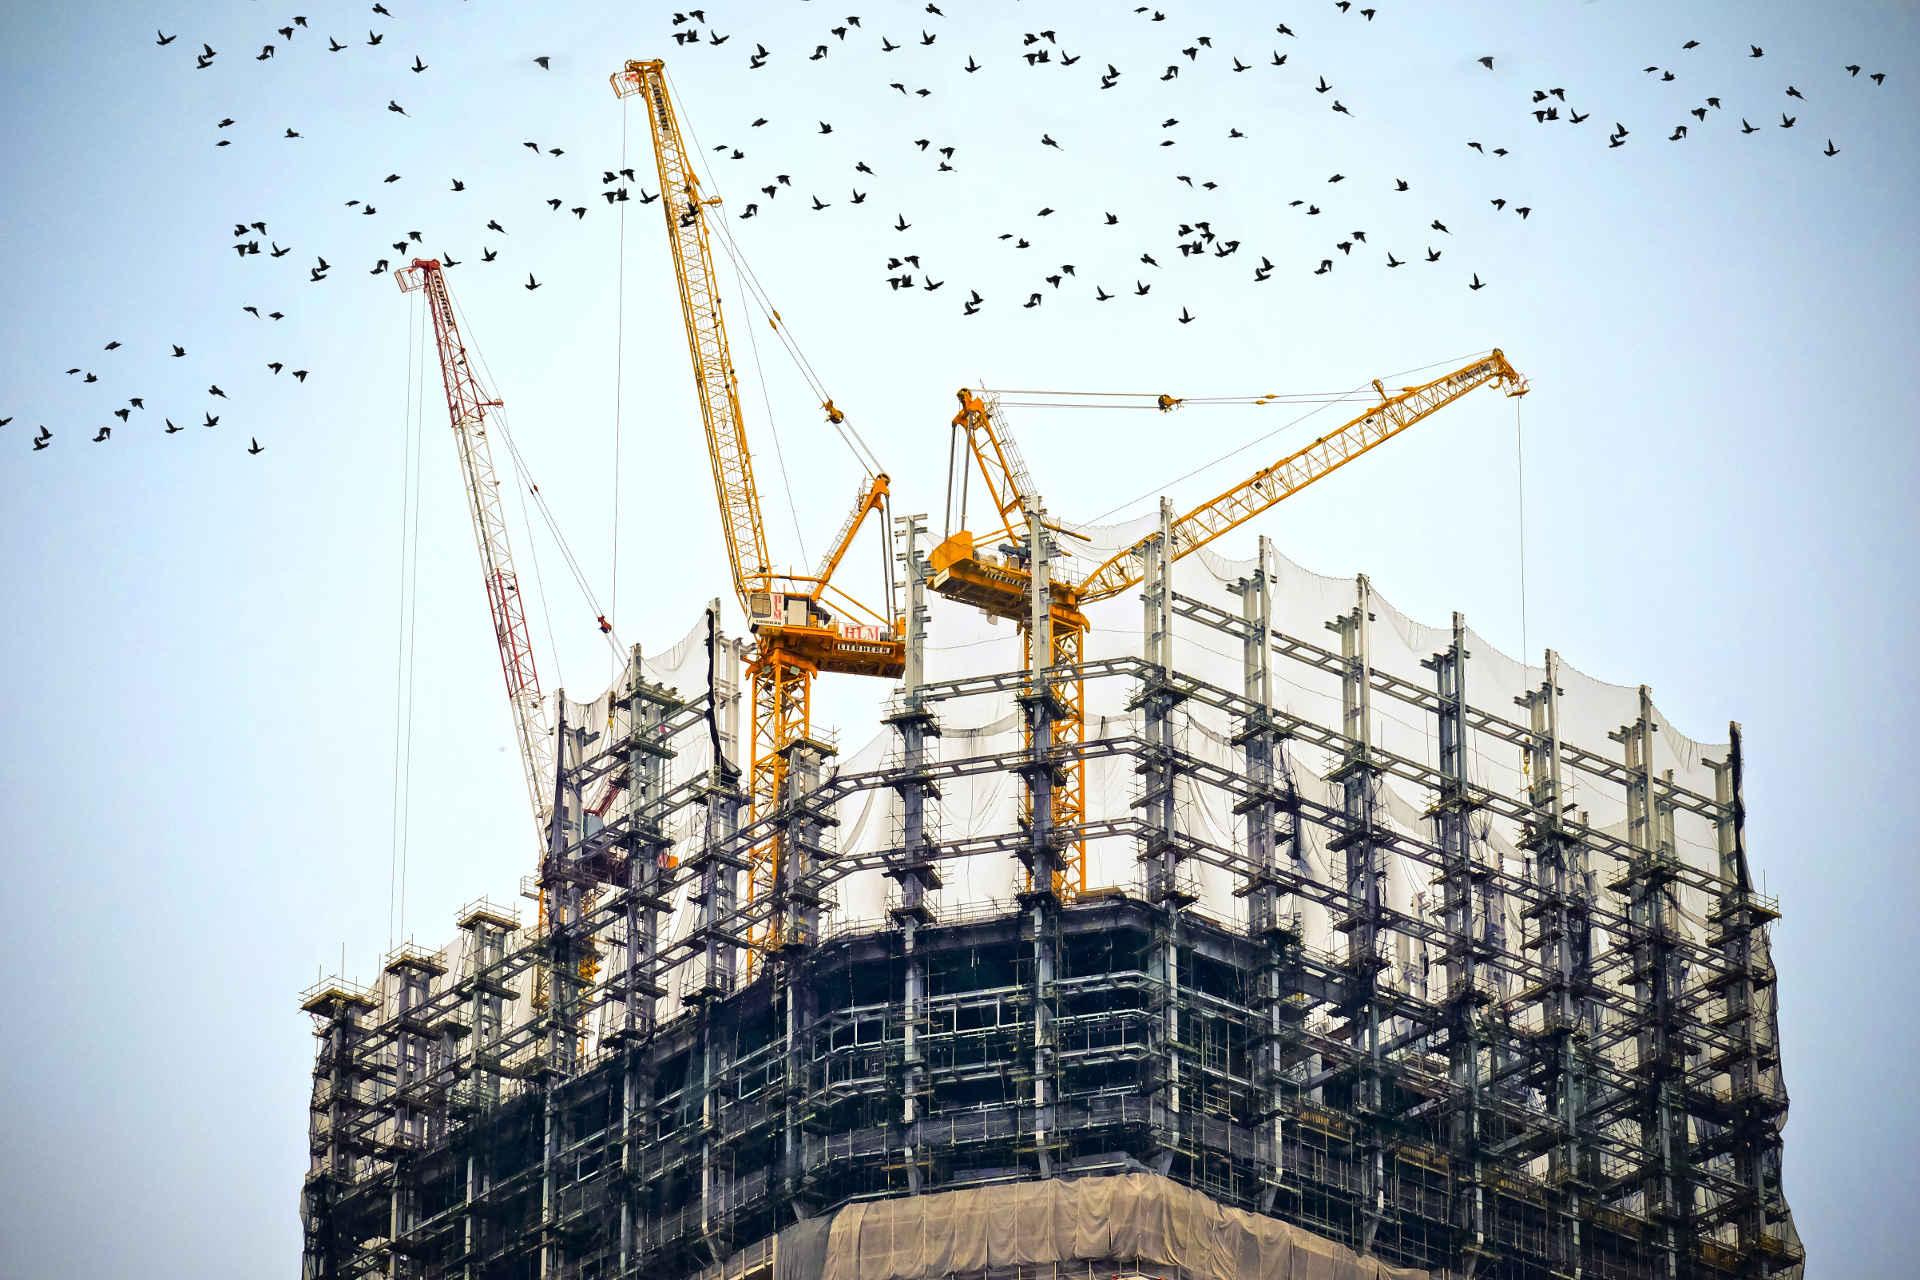 Rohstoff Stahl: Hochhaus Baustelle